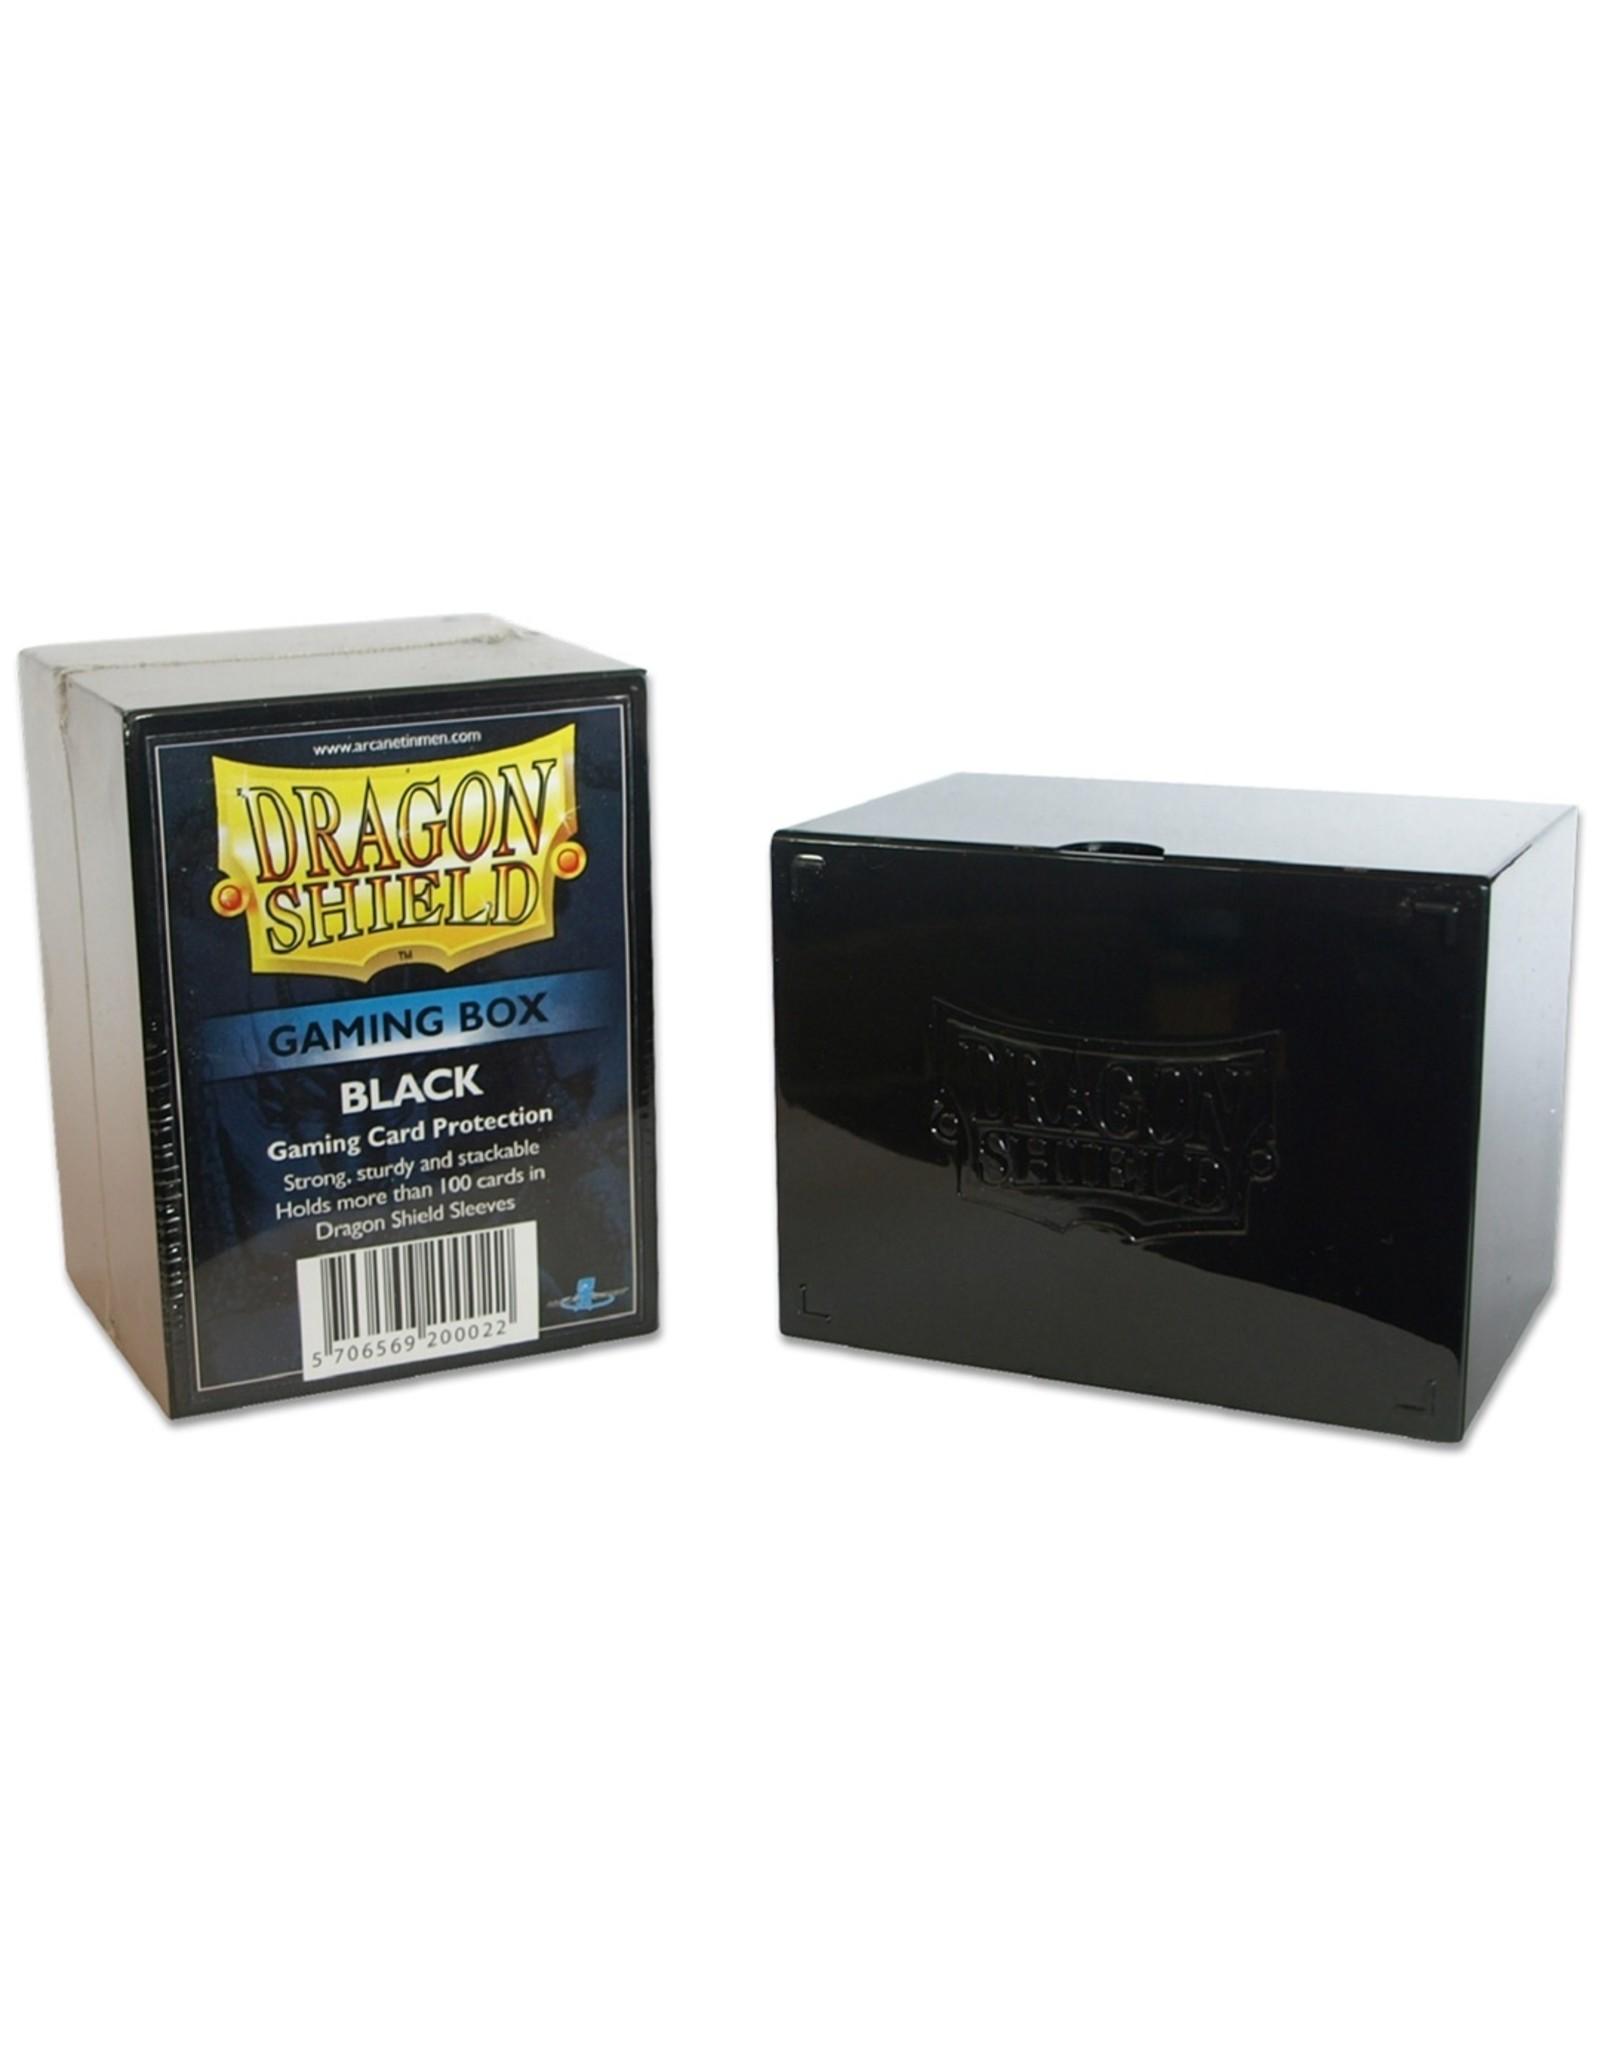 Dragon Shield: Gaming Box Black